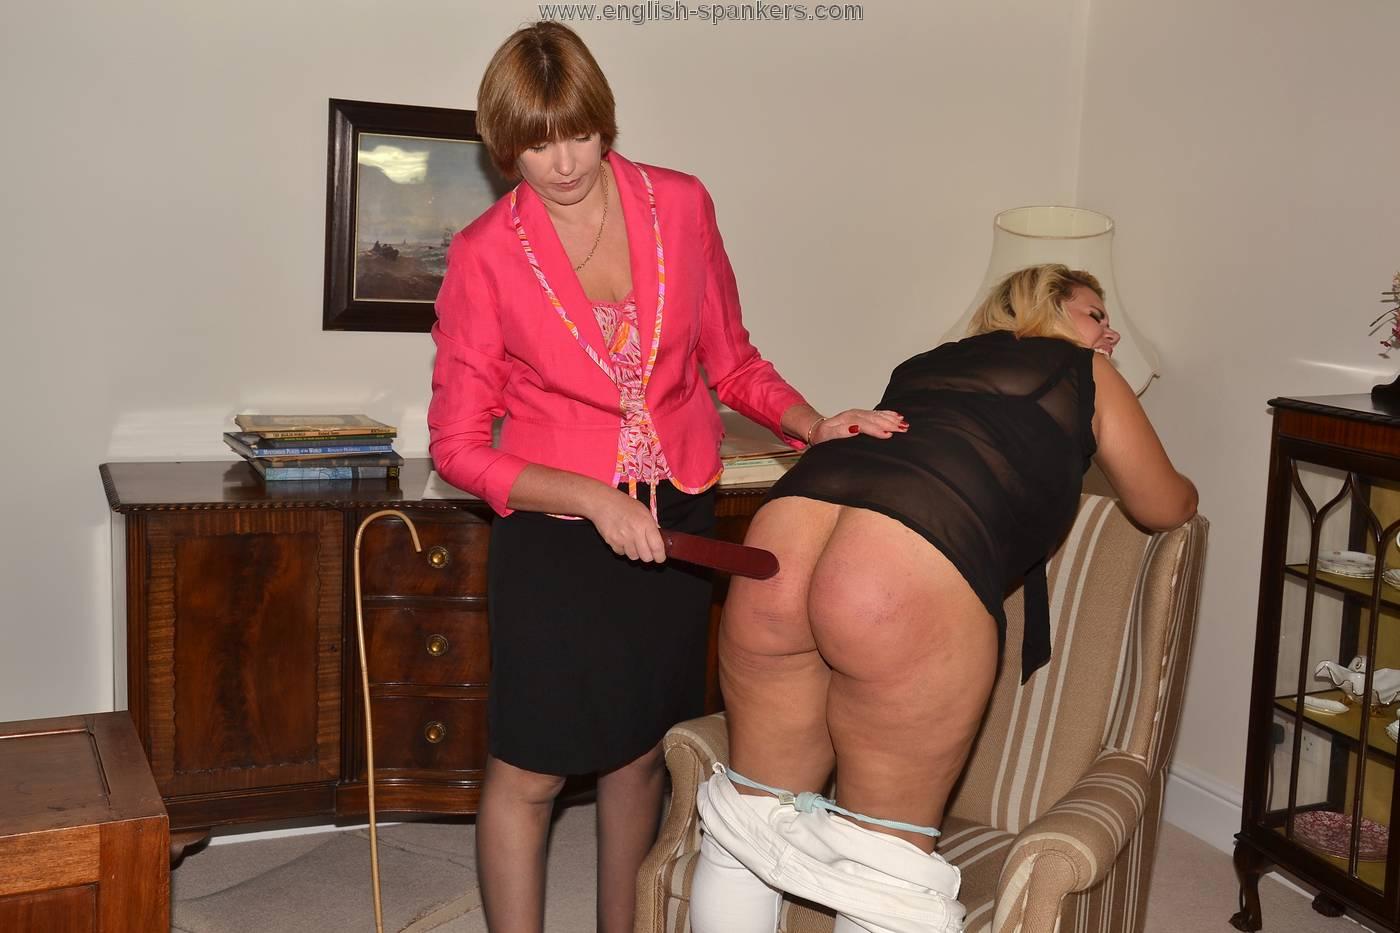 mature women who spank and punish